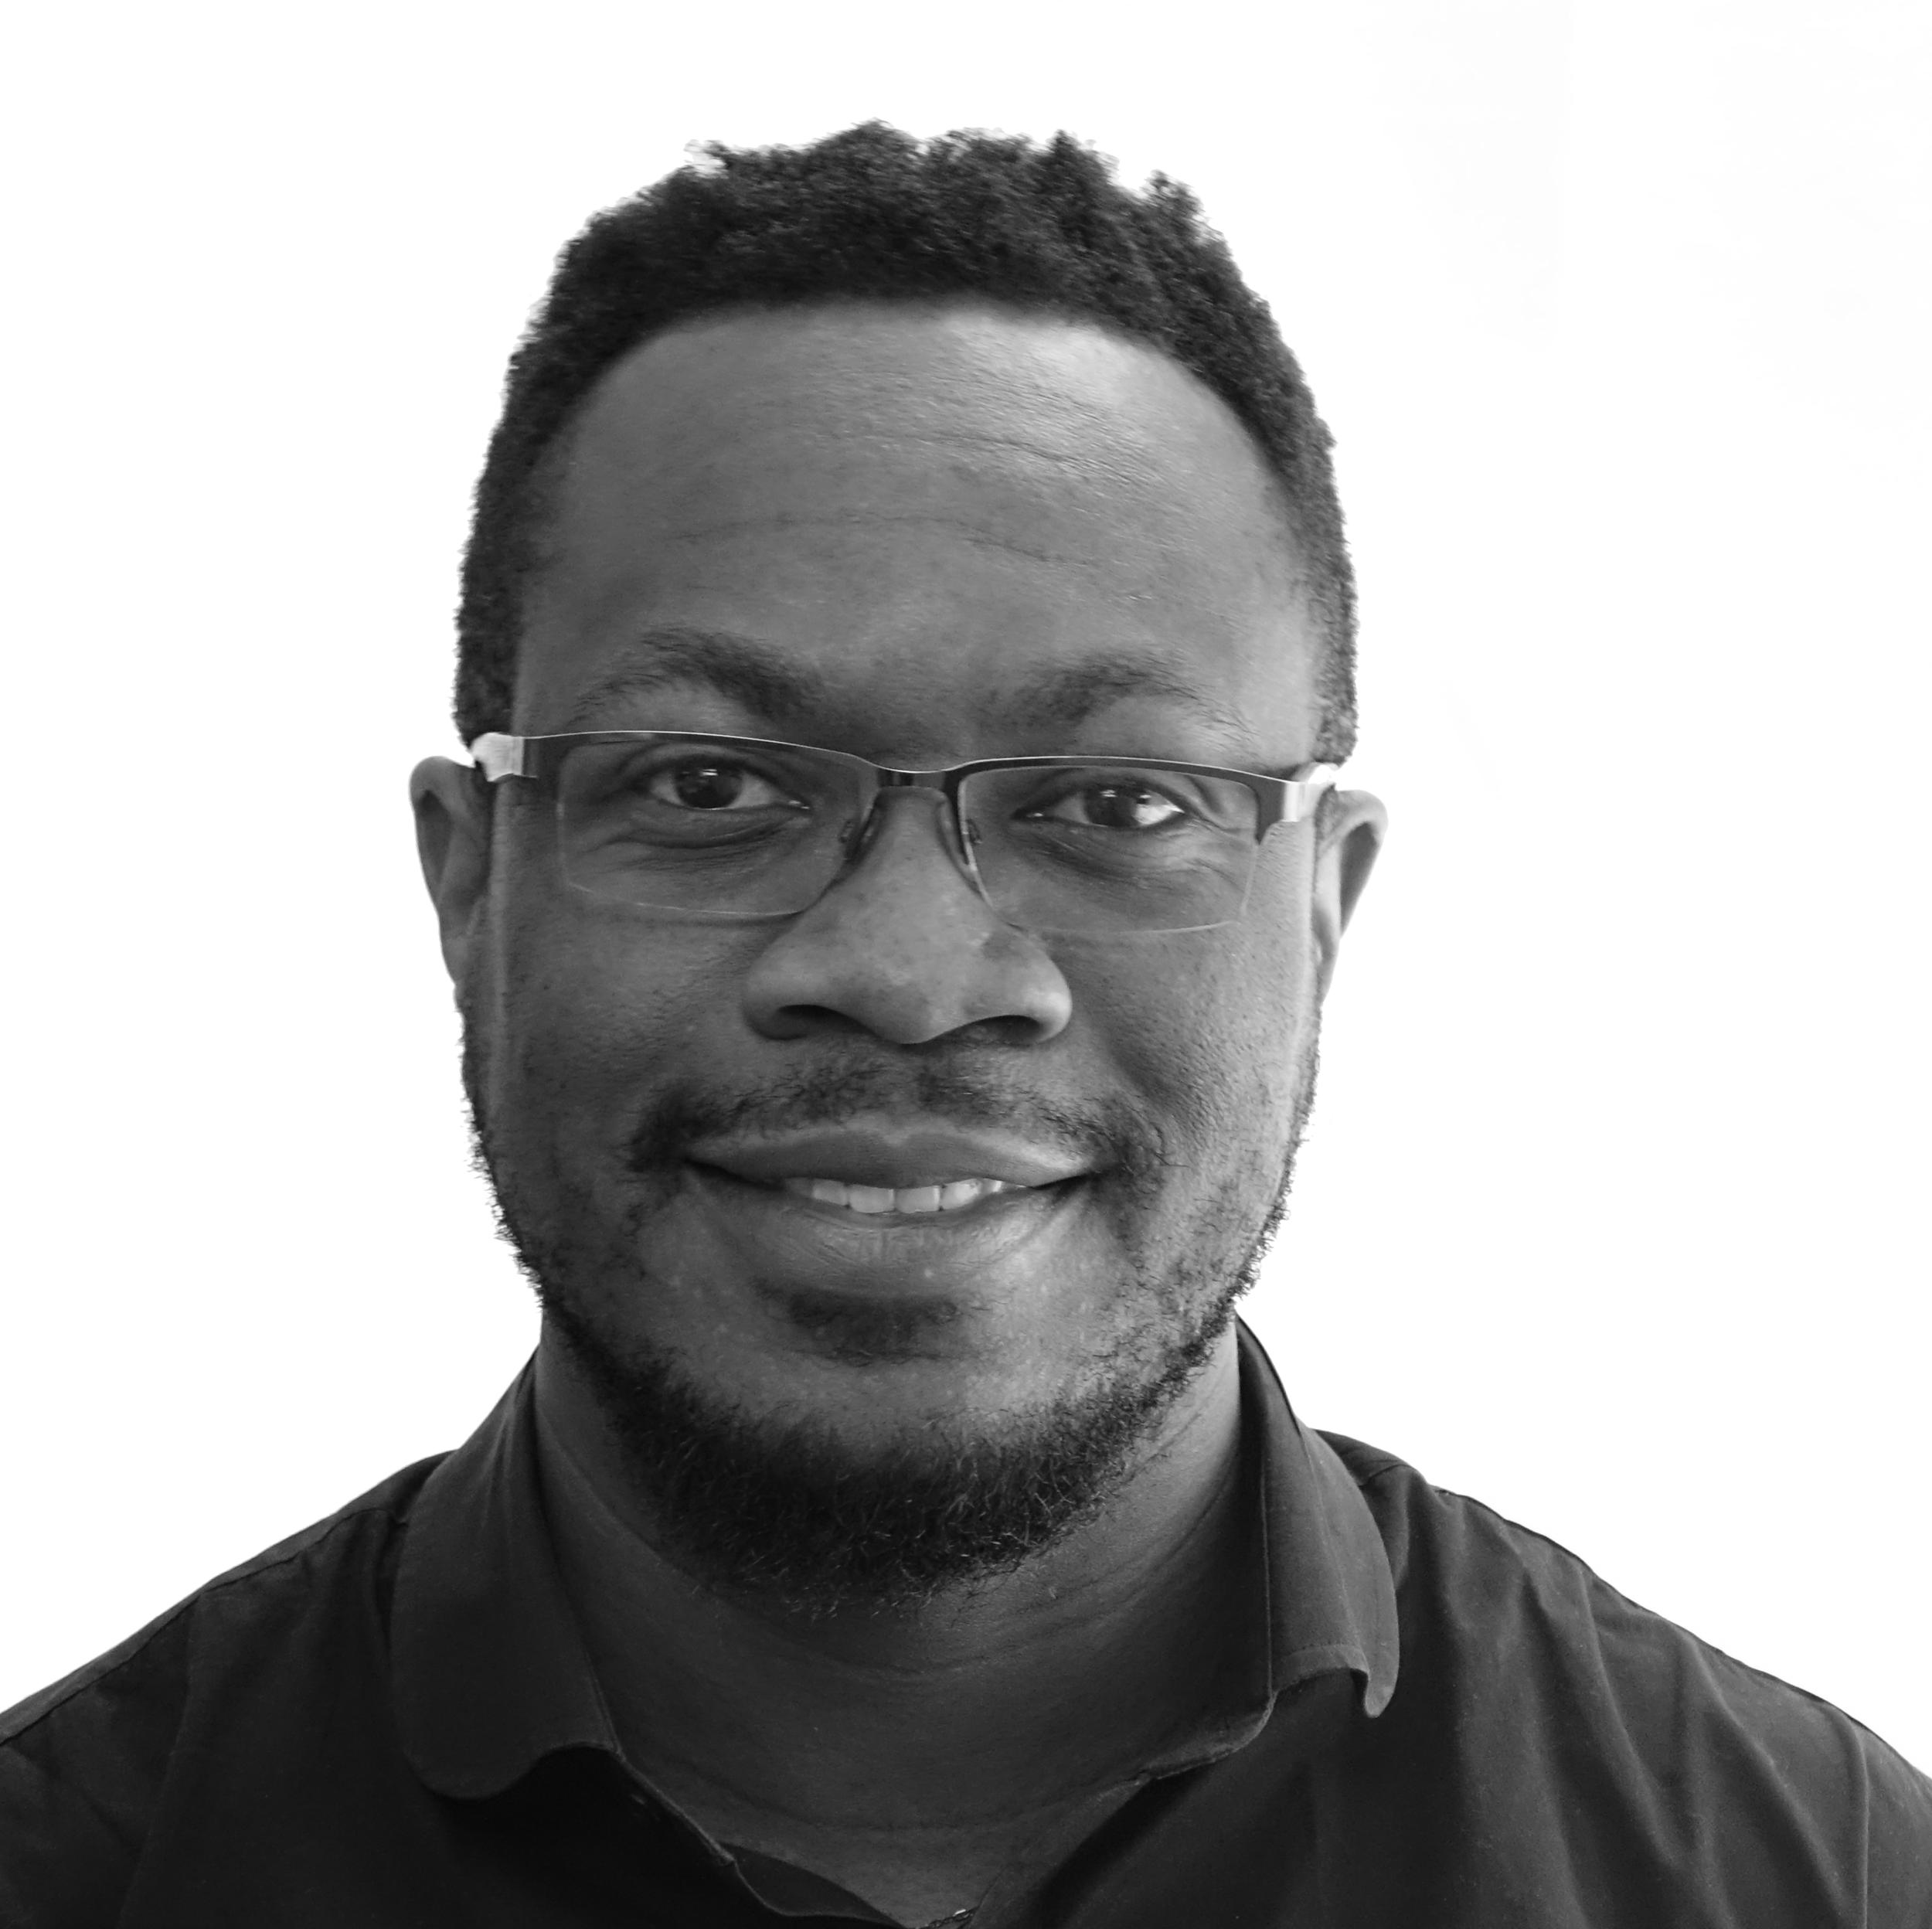 Chiz Chikwendu - CTO